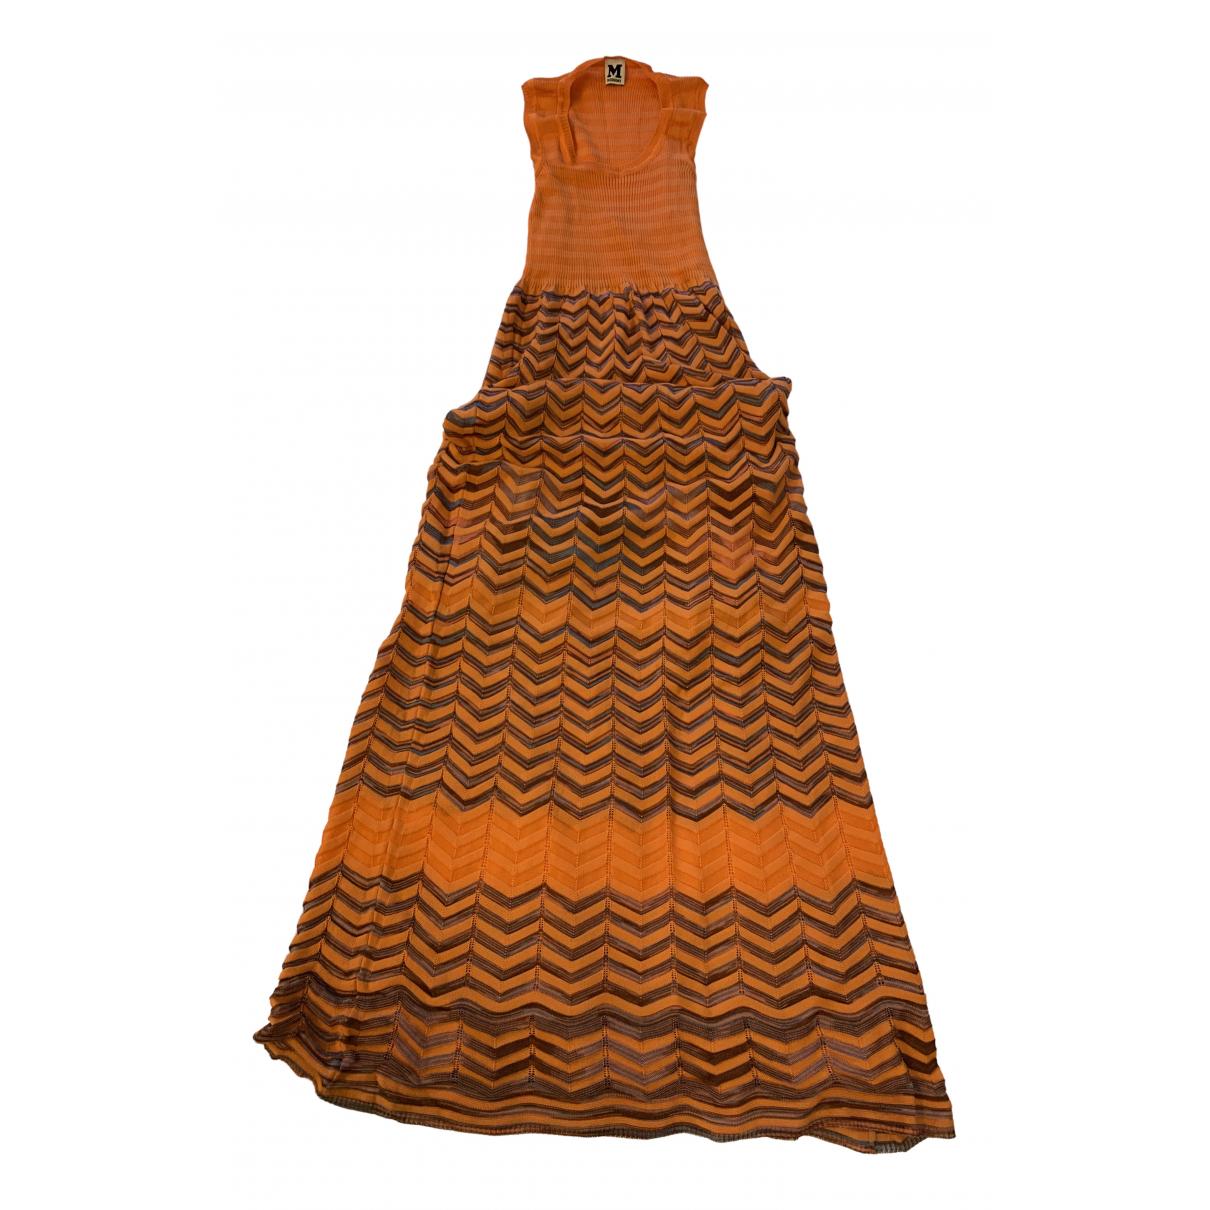 M Missoni N Orange Cotton - elasthane dress for Women 42 IT